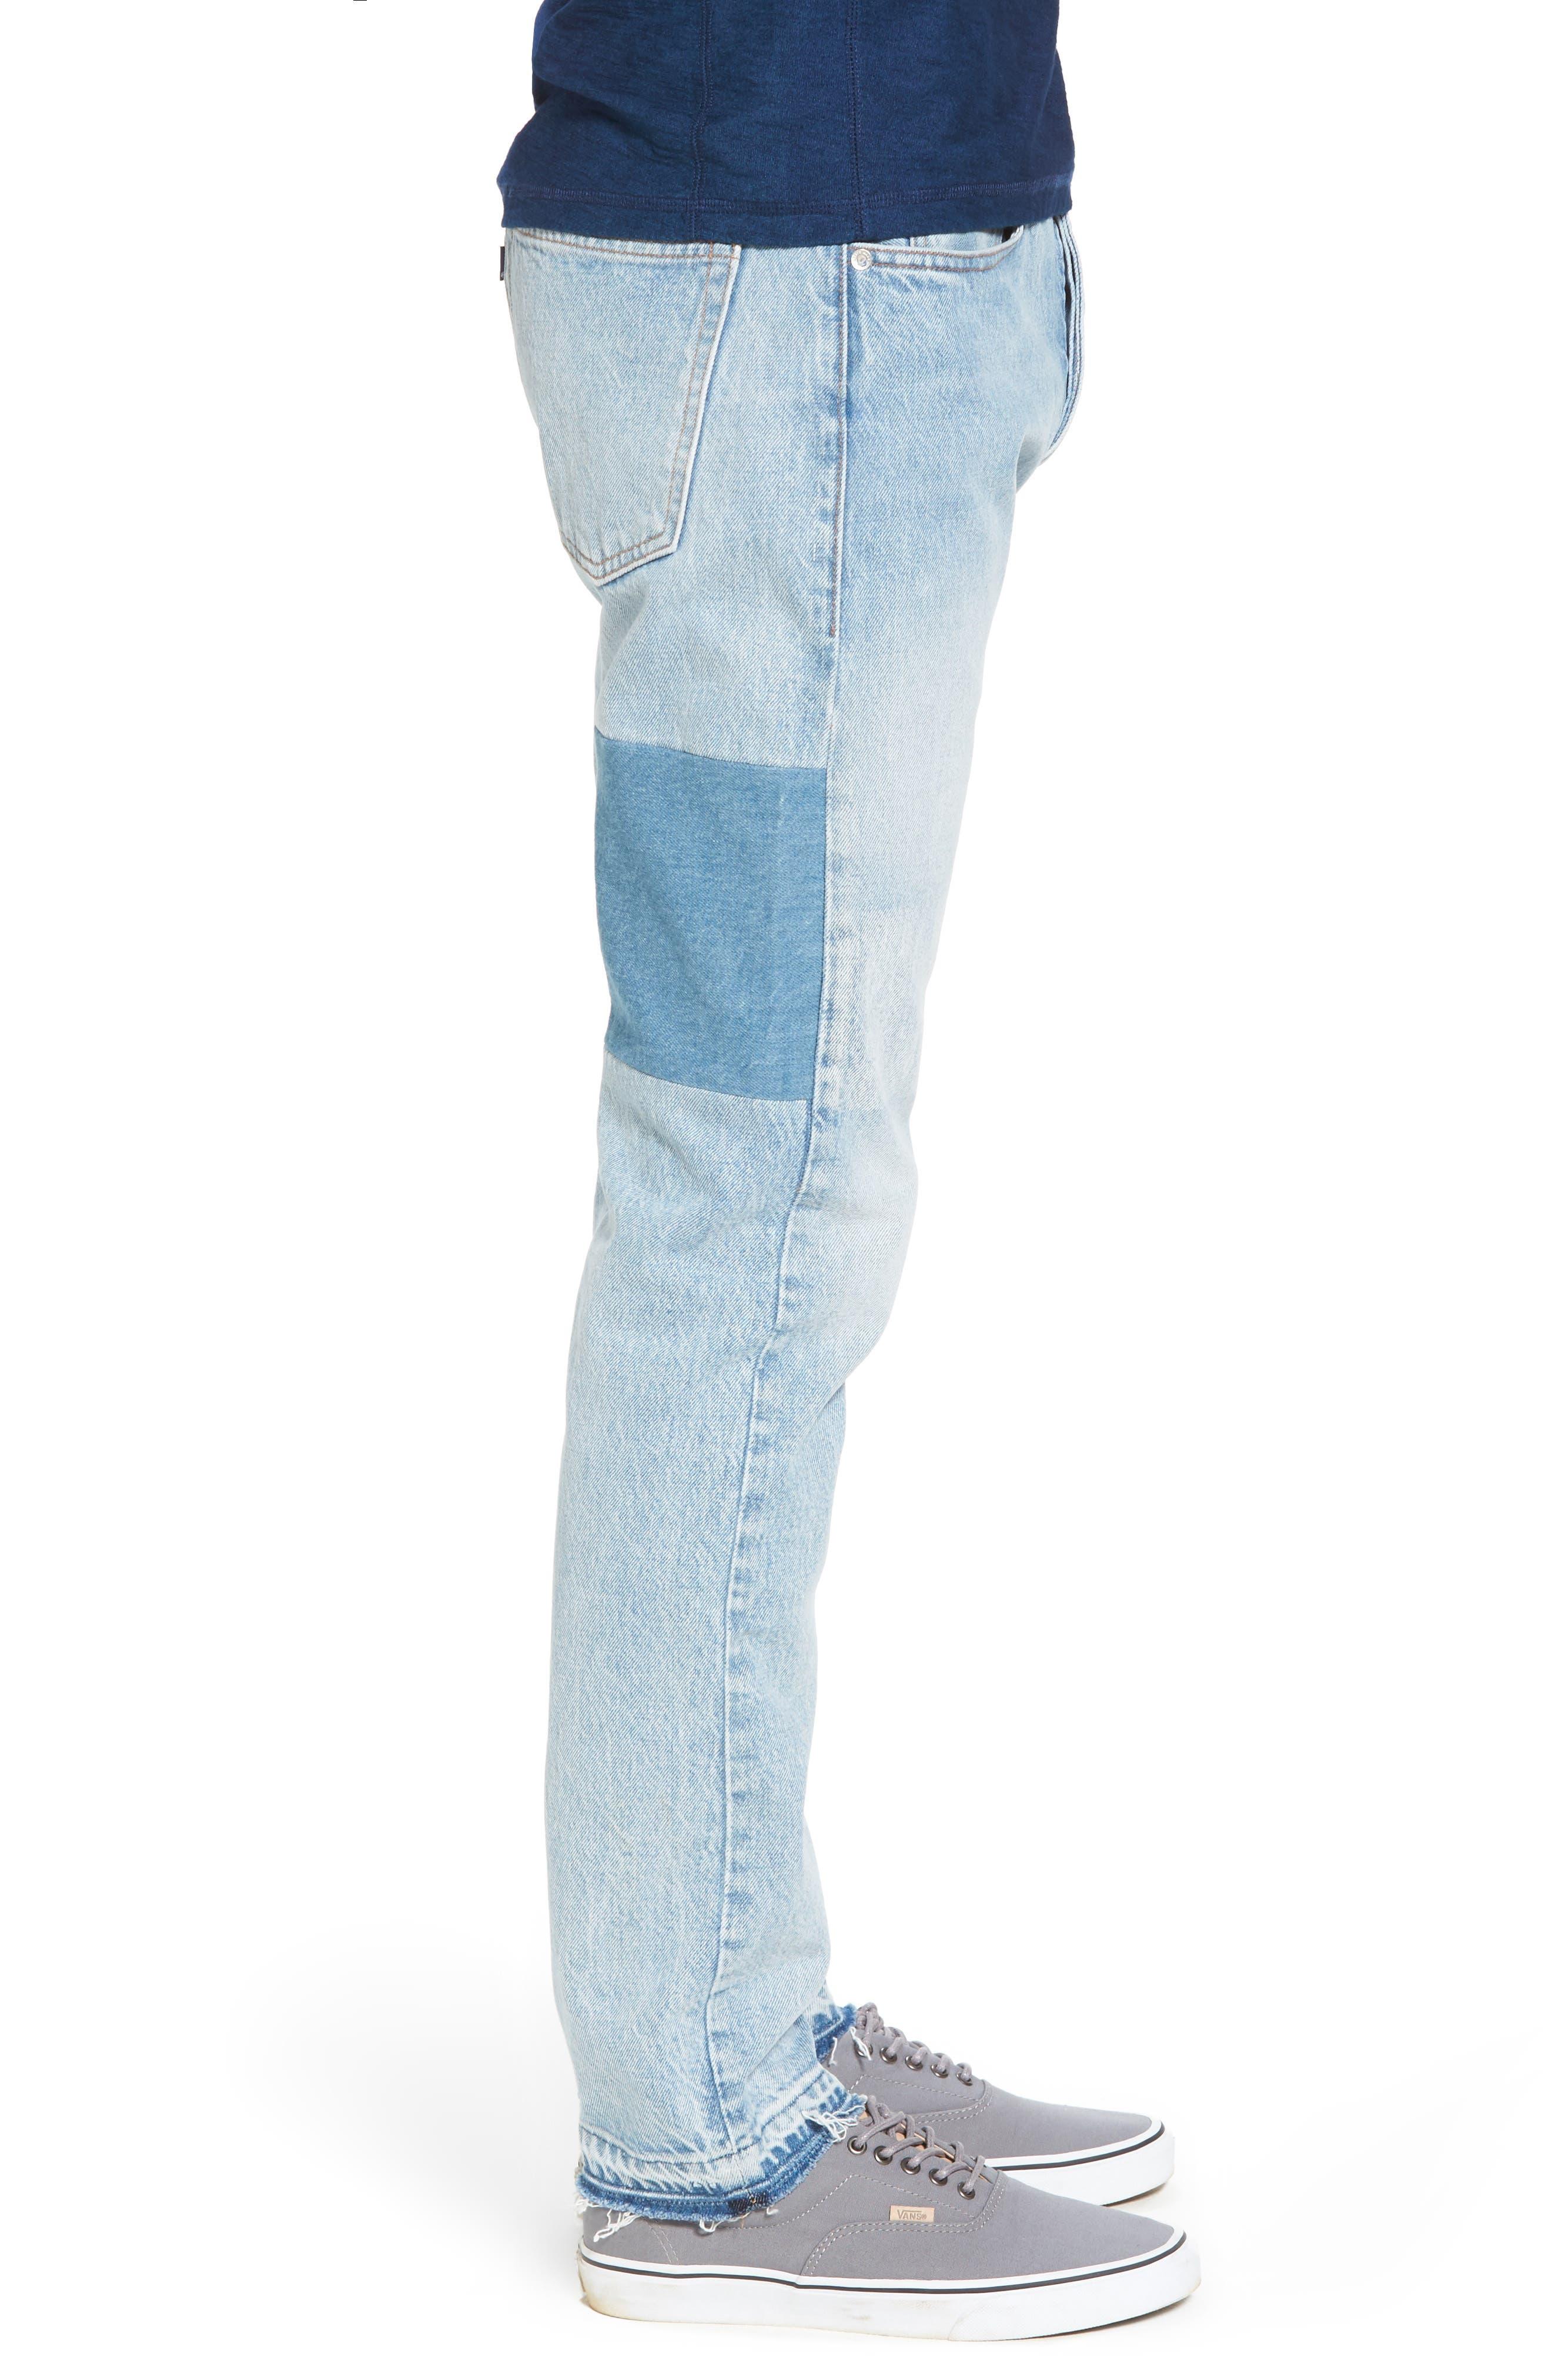 Studio Slim Fit Jeans,                             Alternate thumbnail 3, color,                             420